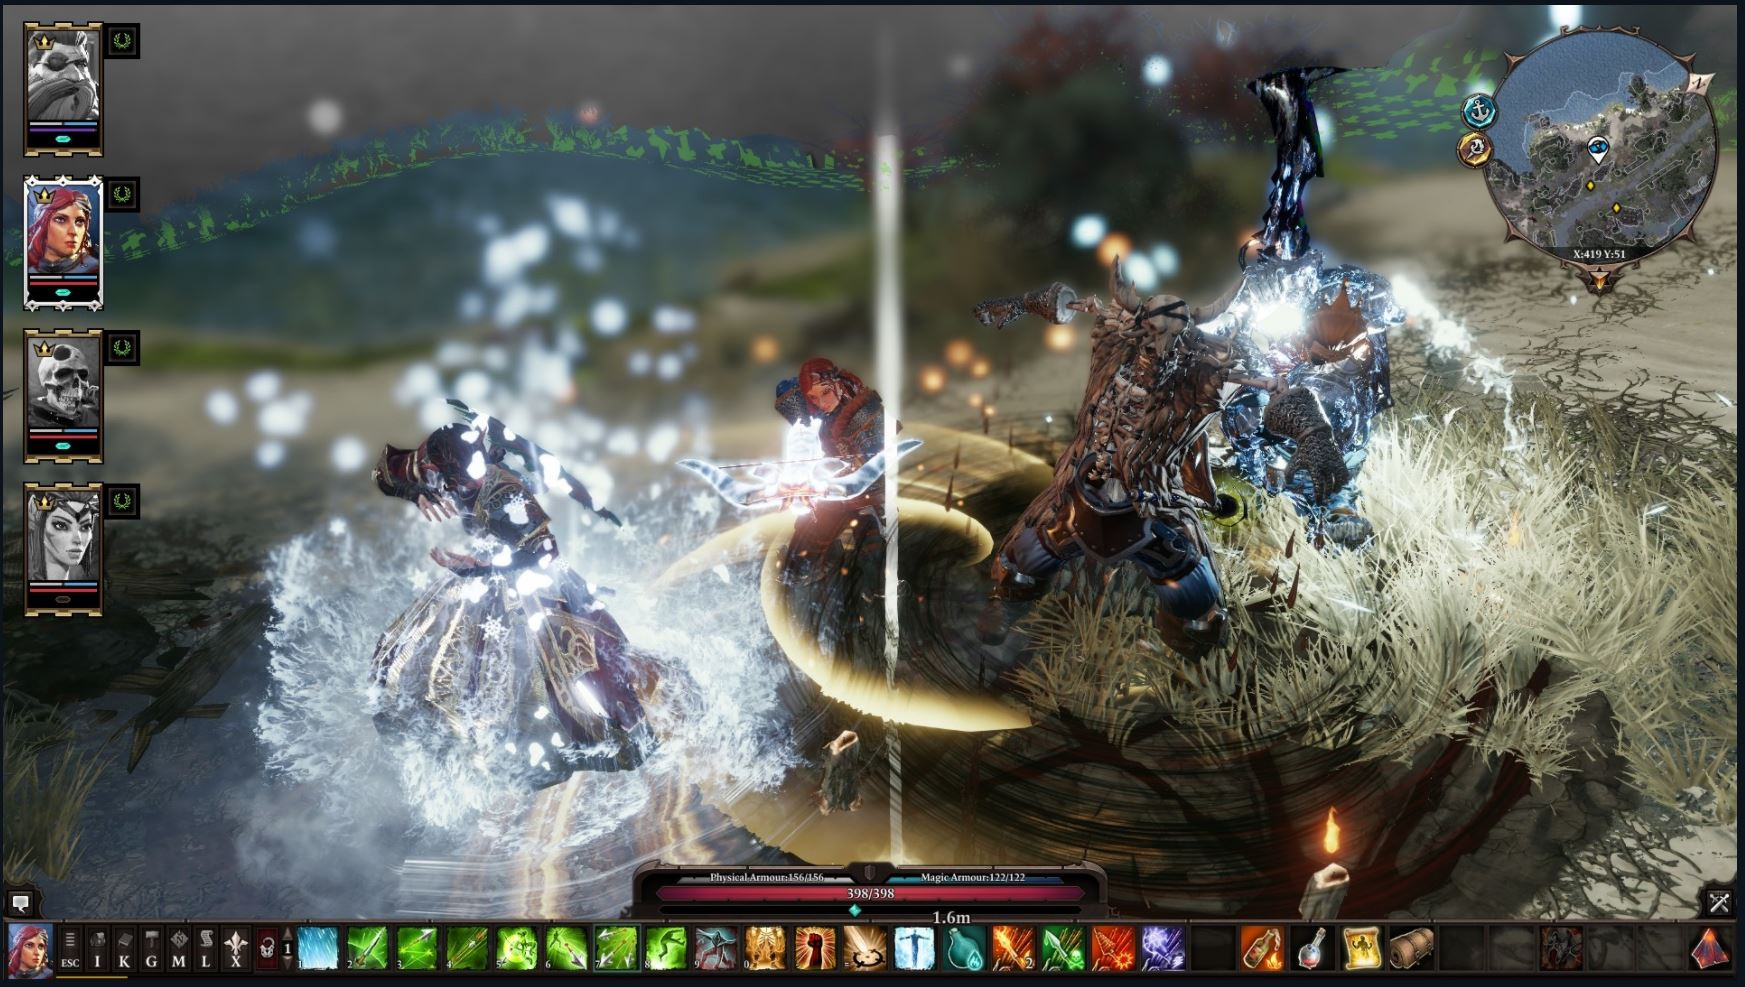 Shacknews Best PC Game of 2017: Divinity: Original Sin 2